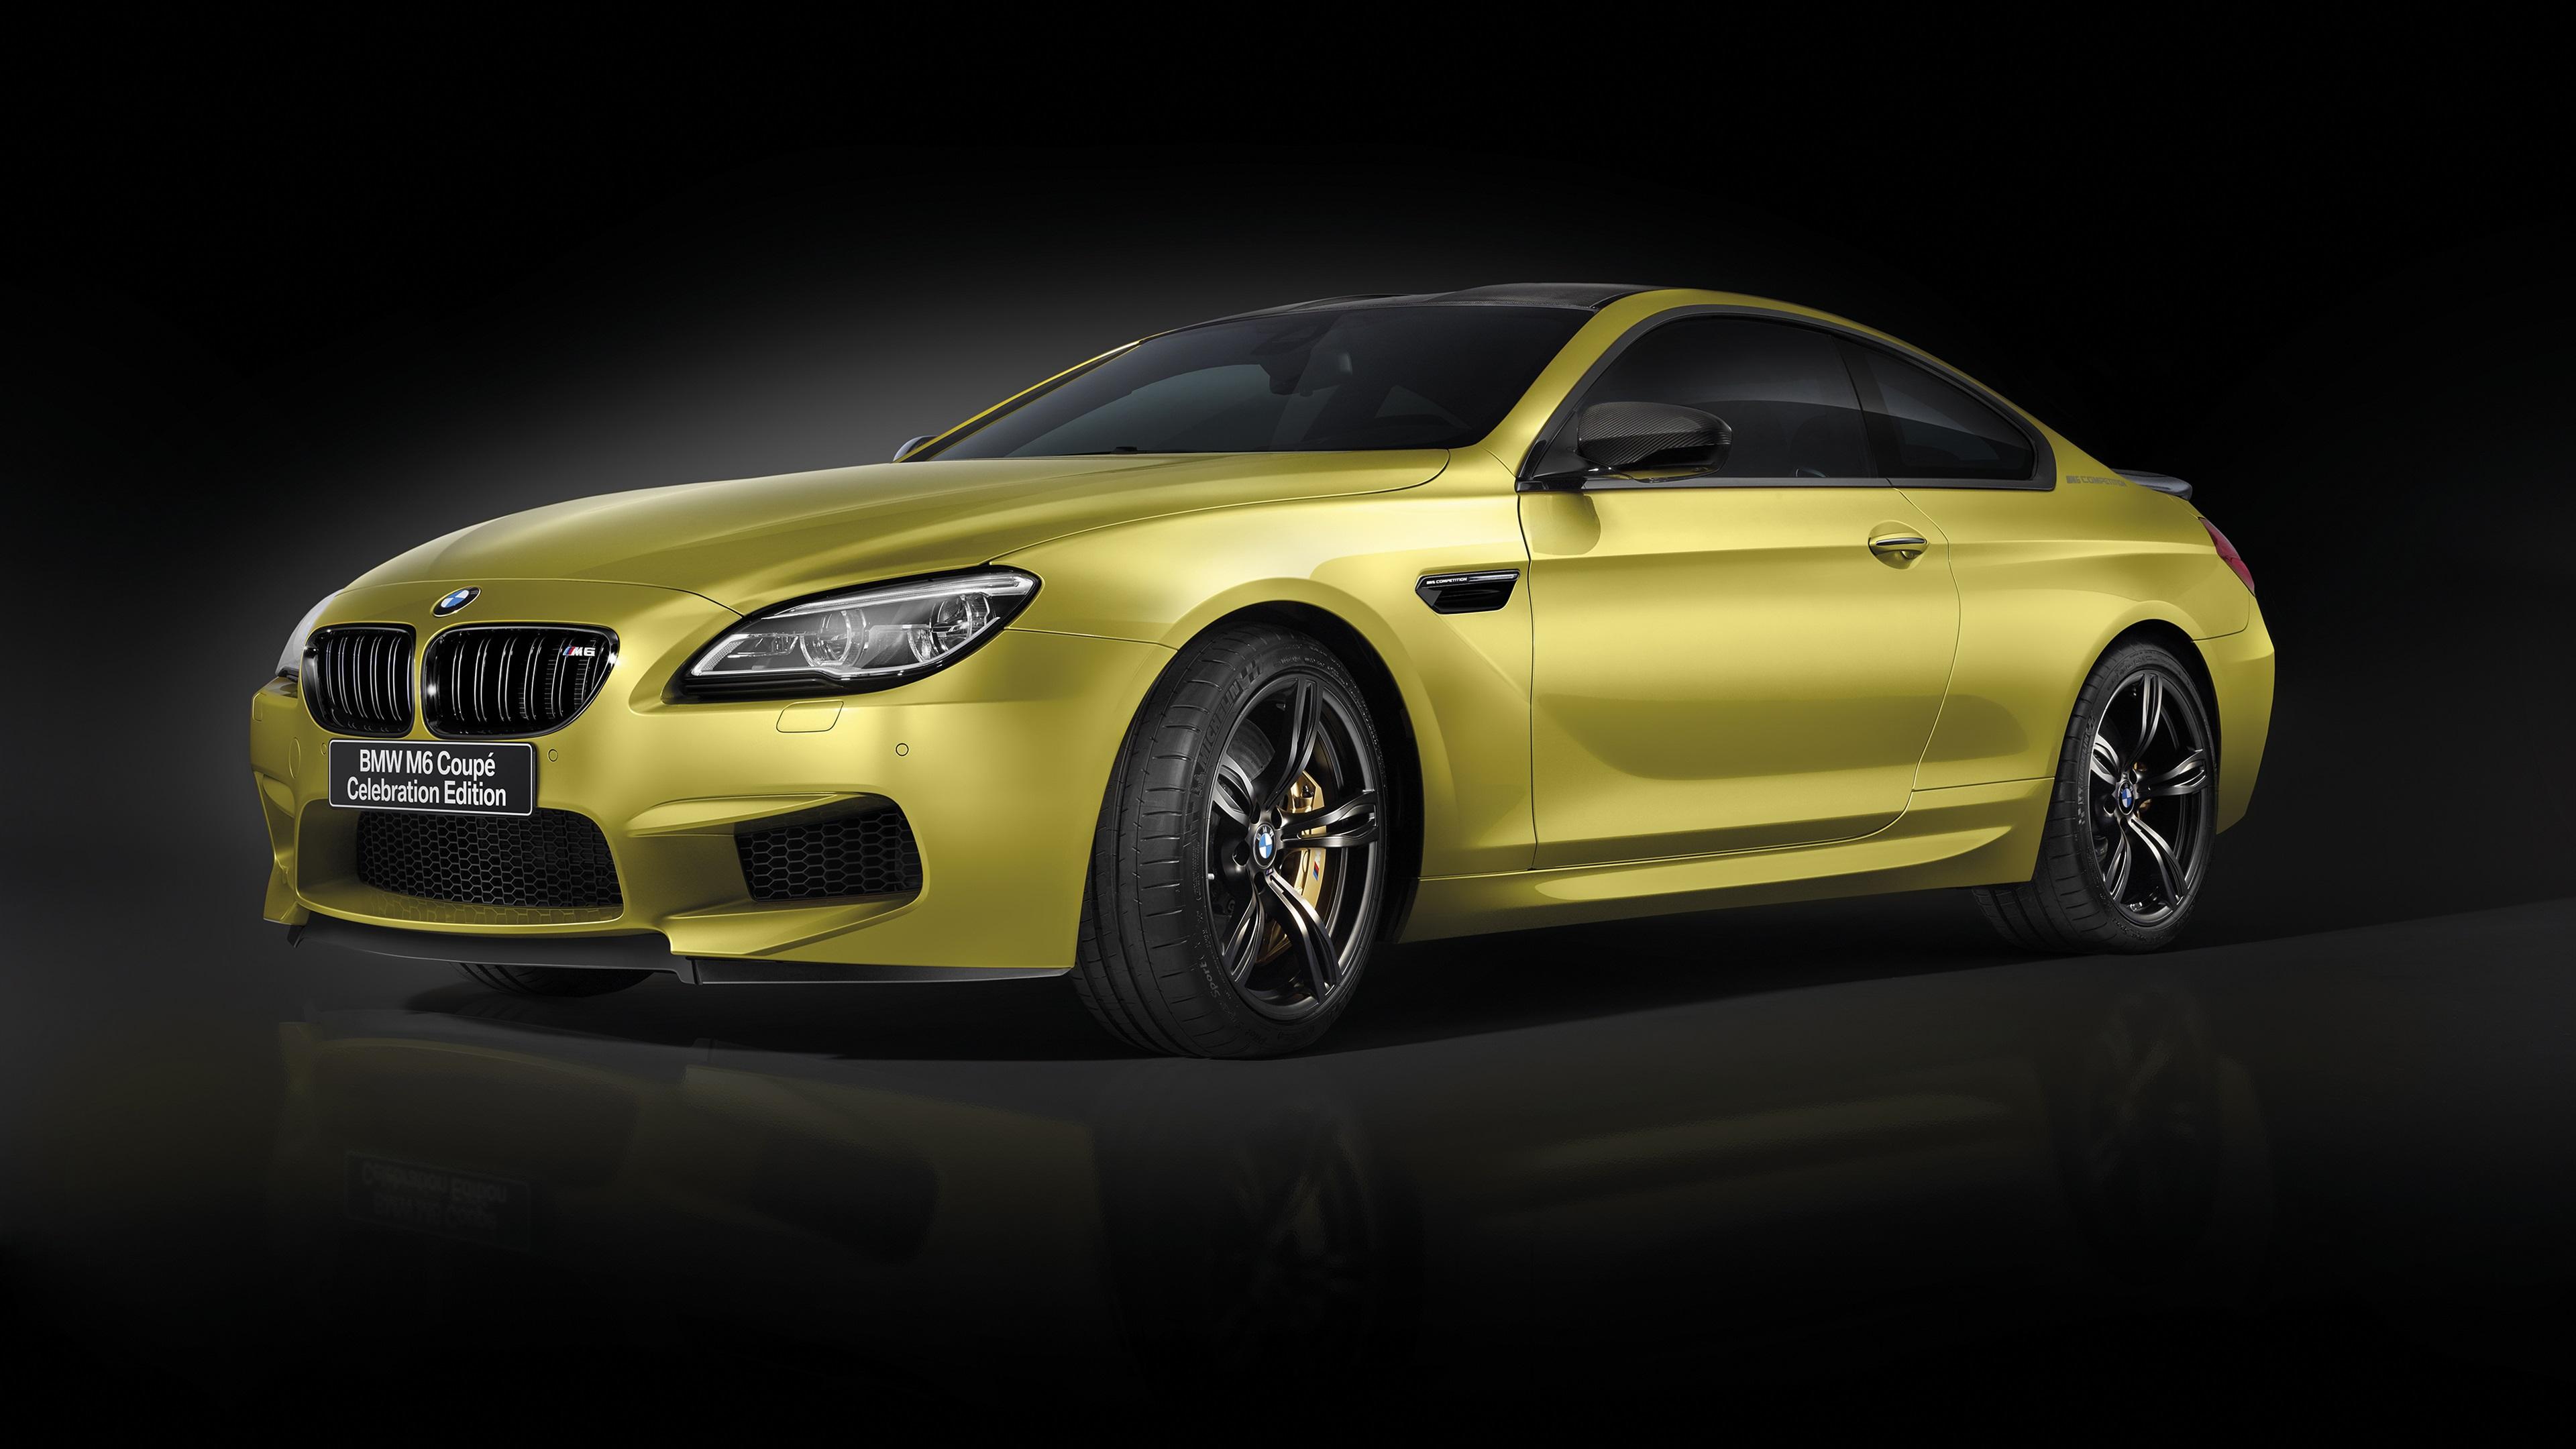 Wallpaper Bmw M6 Coupe Gold Color Car 3840x2160 Uhd 4k